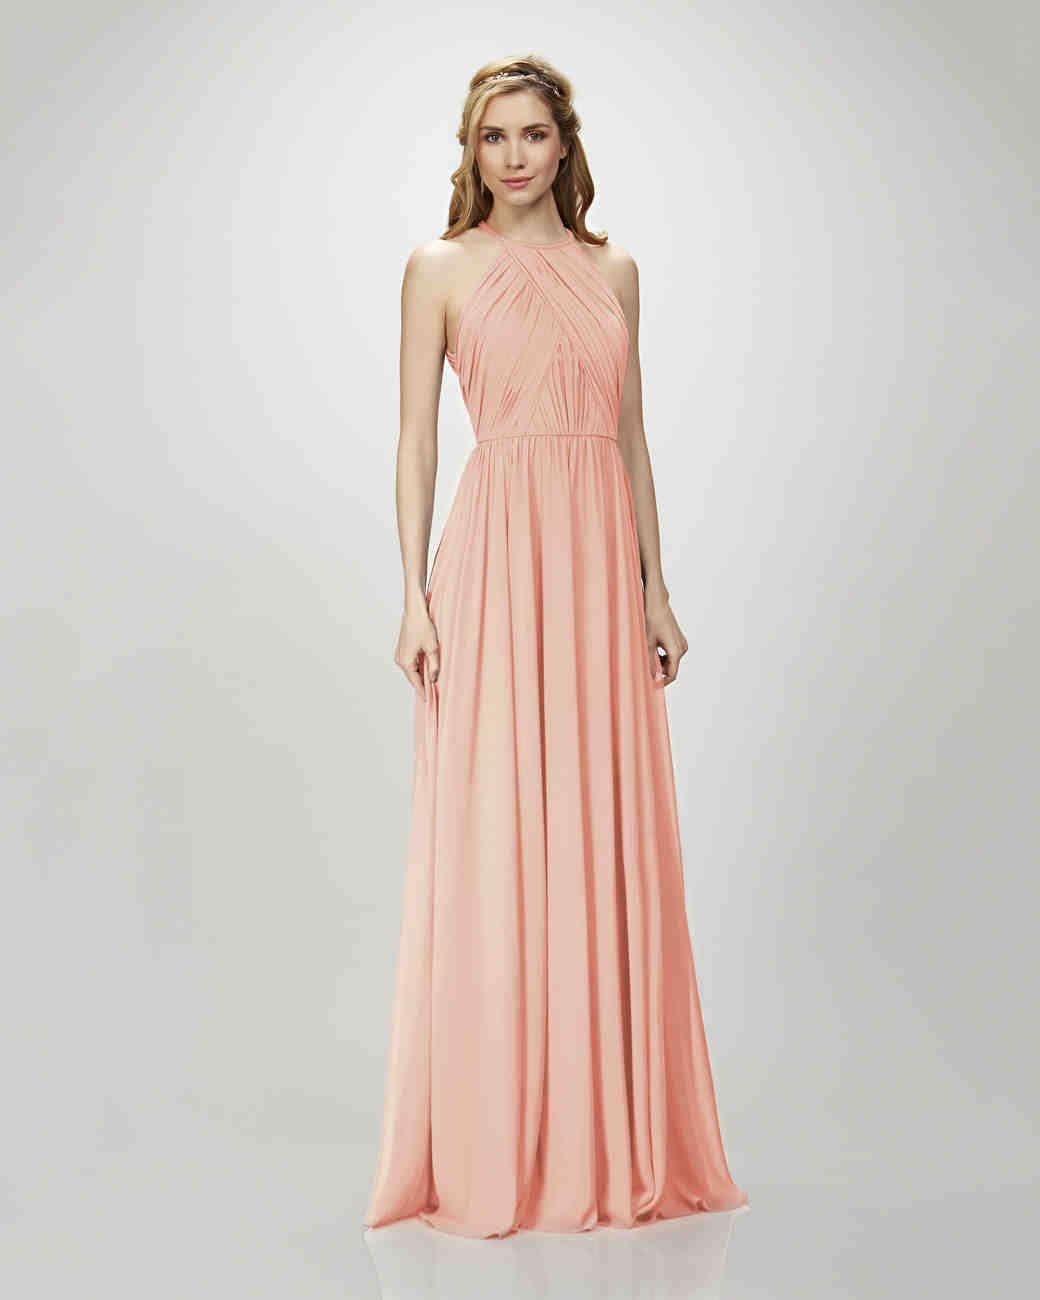 Coral bridesmaid dresses martha stewart weddings ombrellifo Images